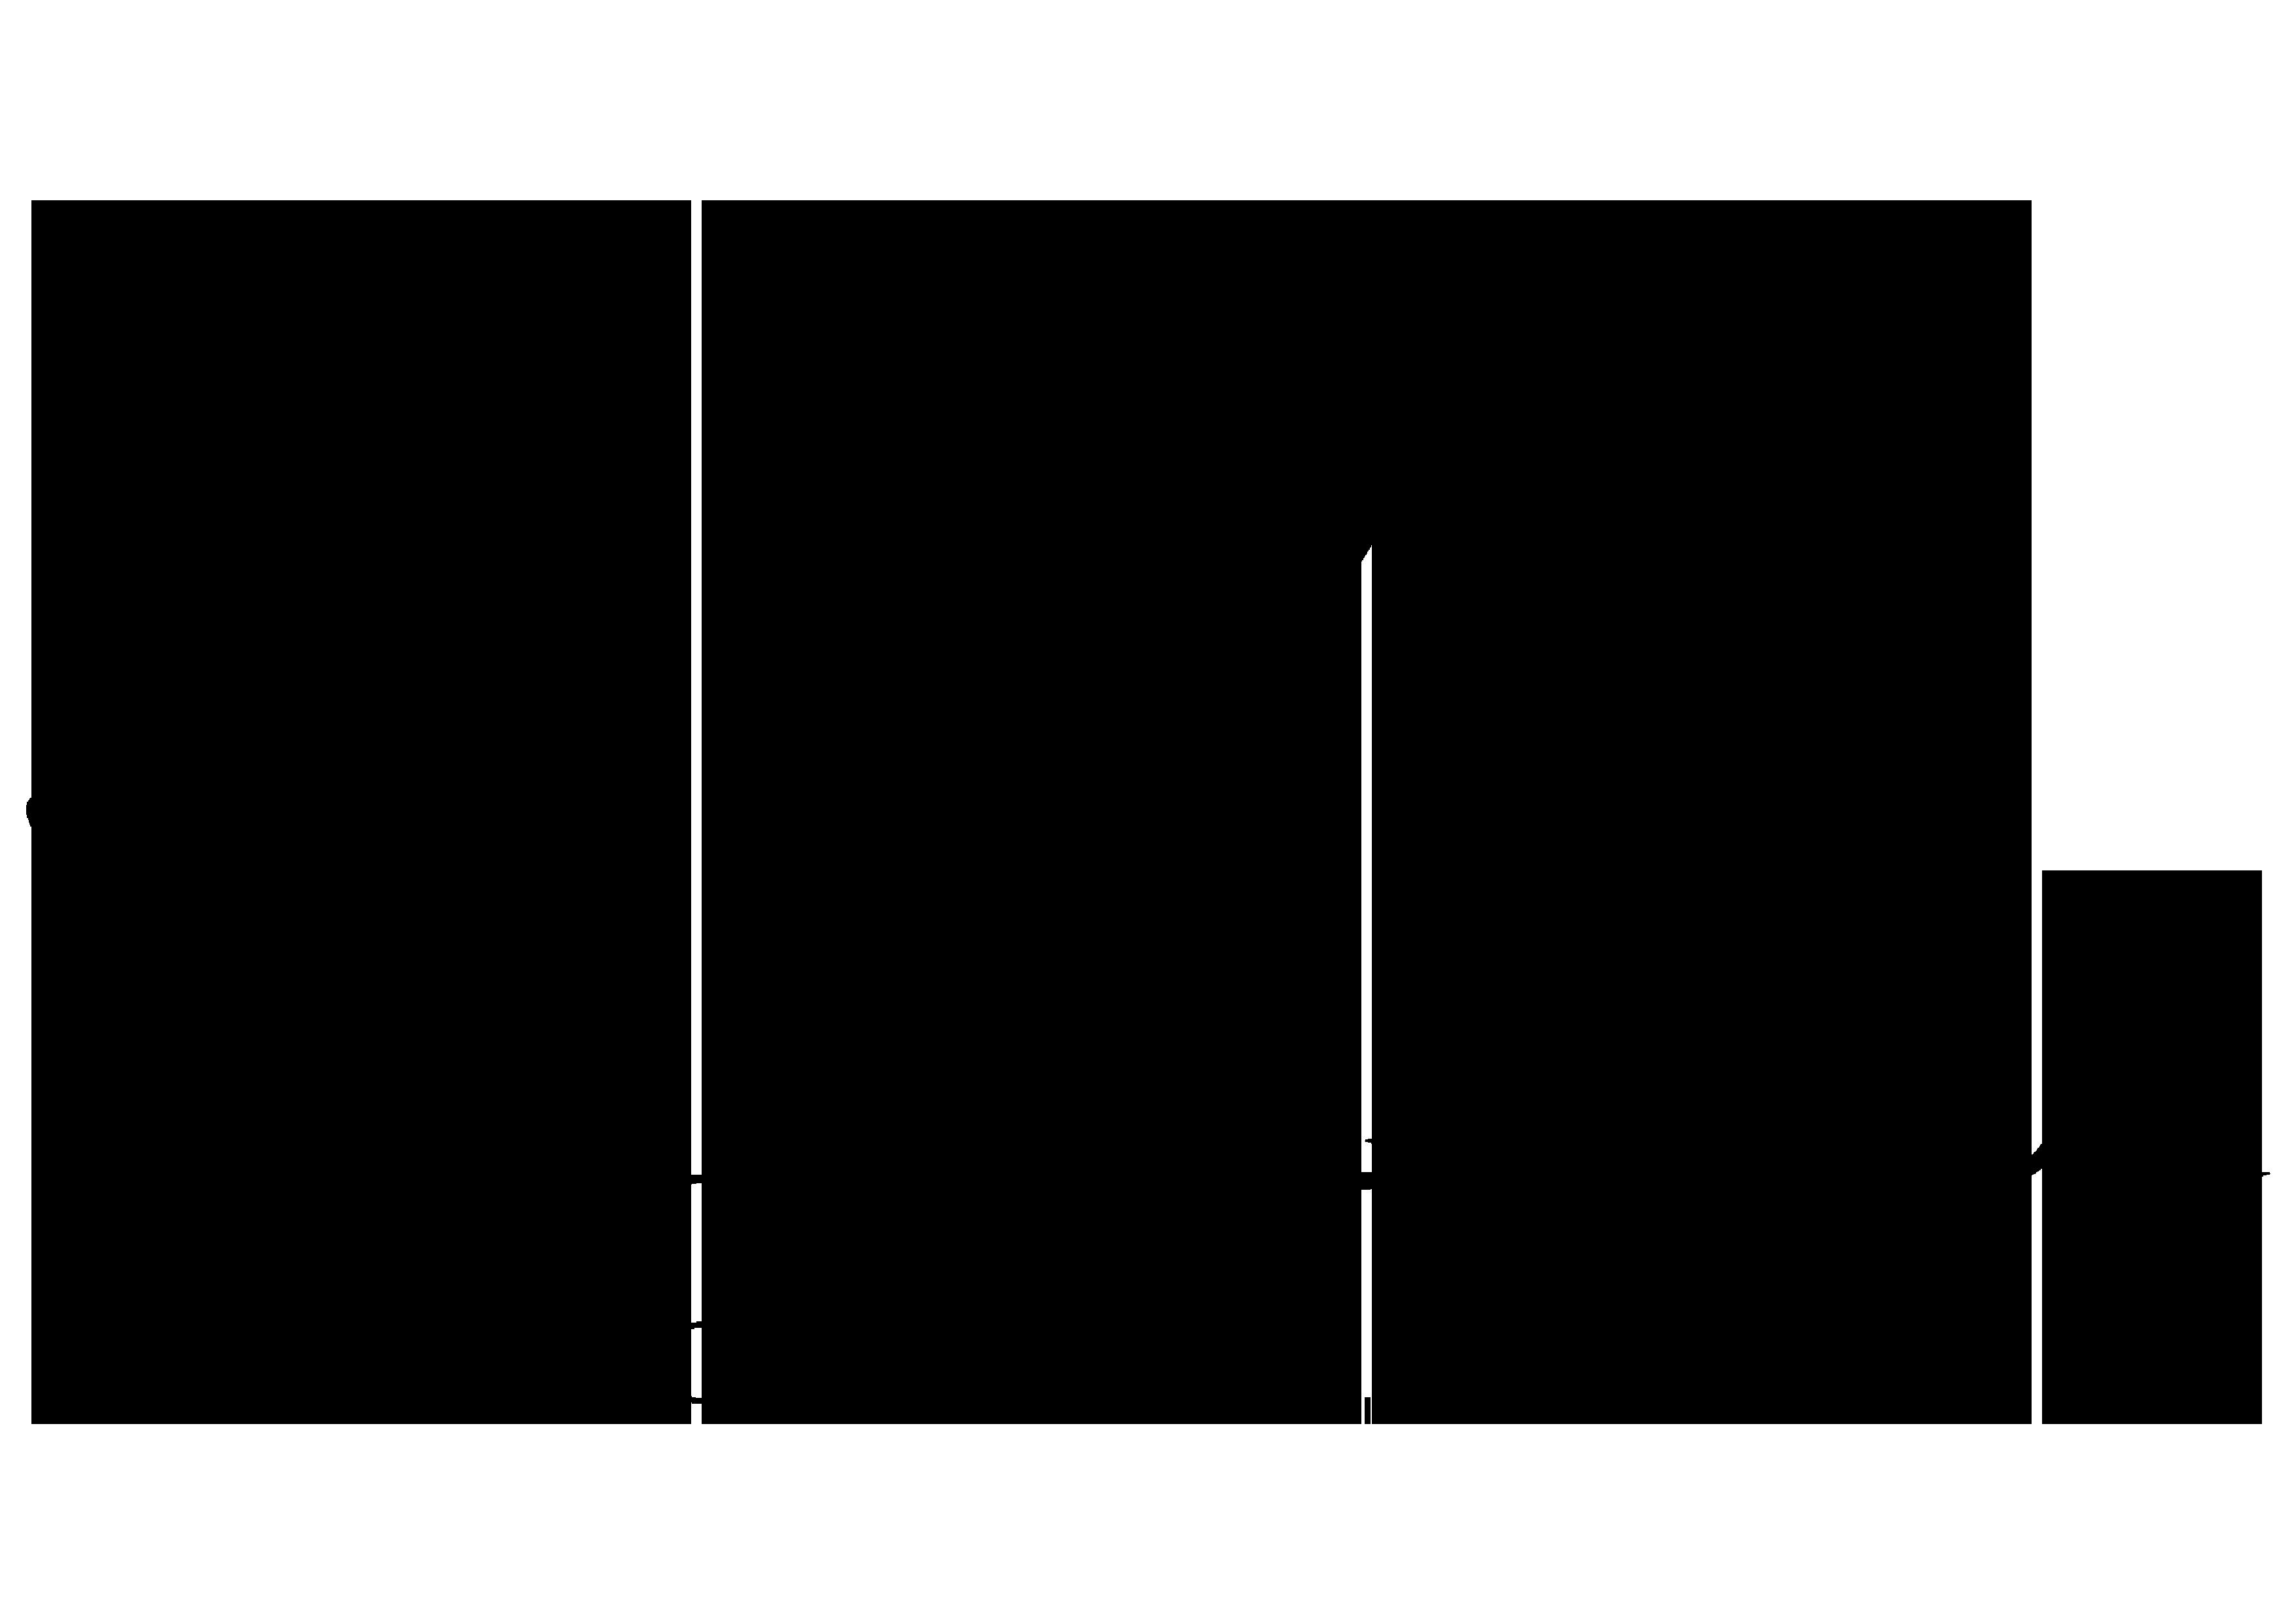 Vila Victória